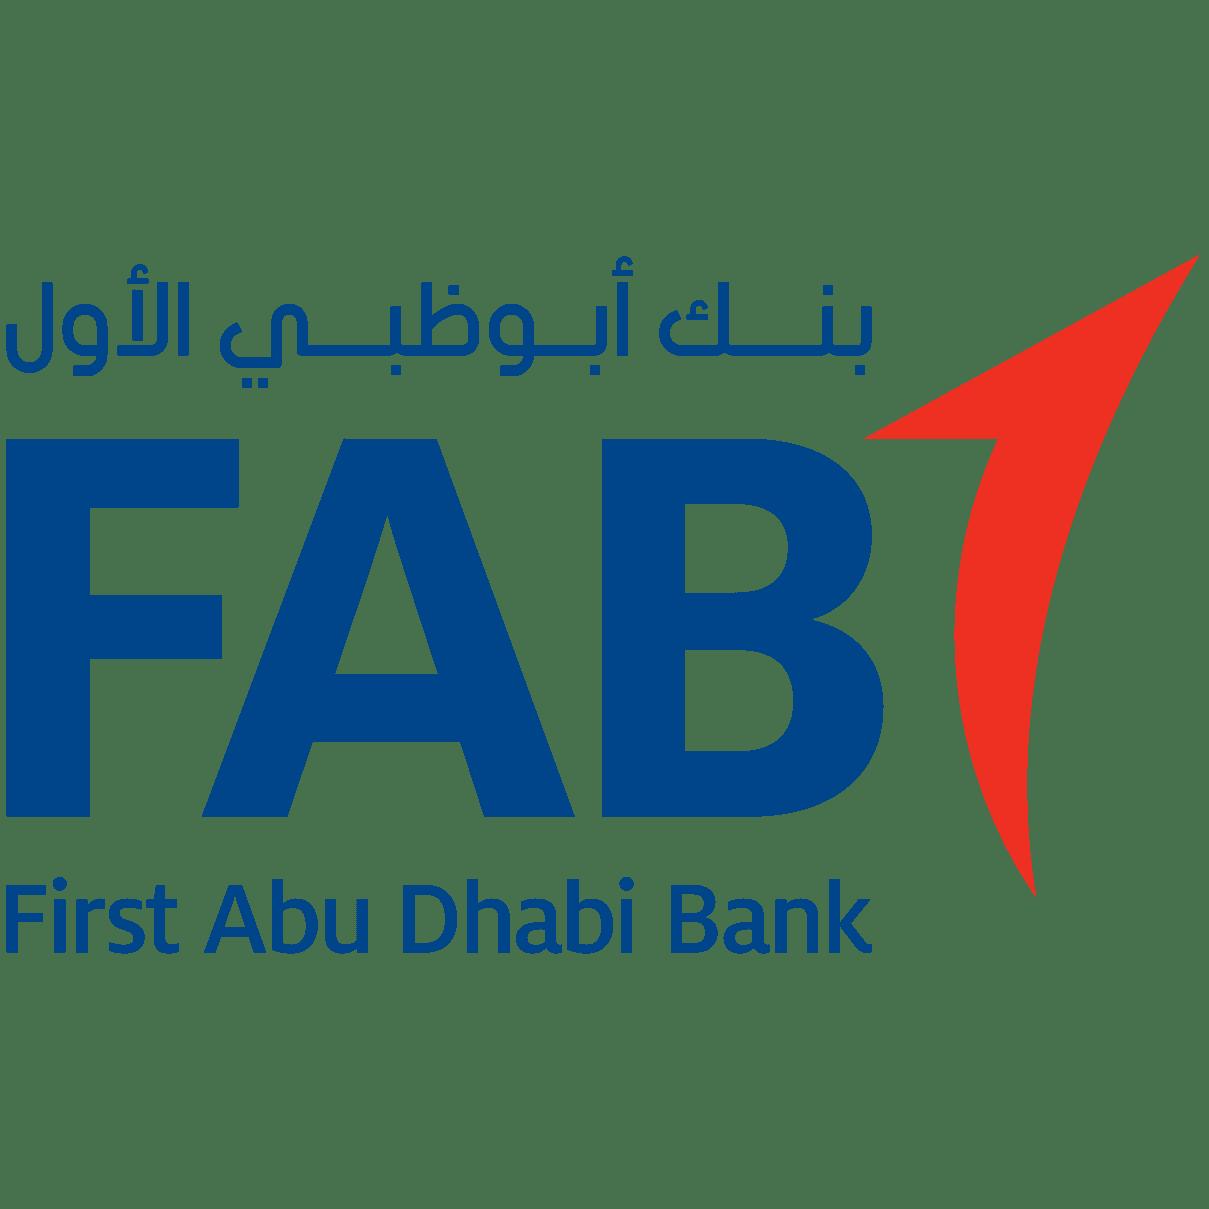 First Abu Dhabi Bank - 3D Virtual Events Platform in Dubai, UAE